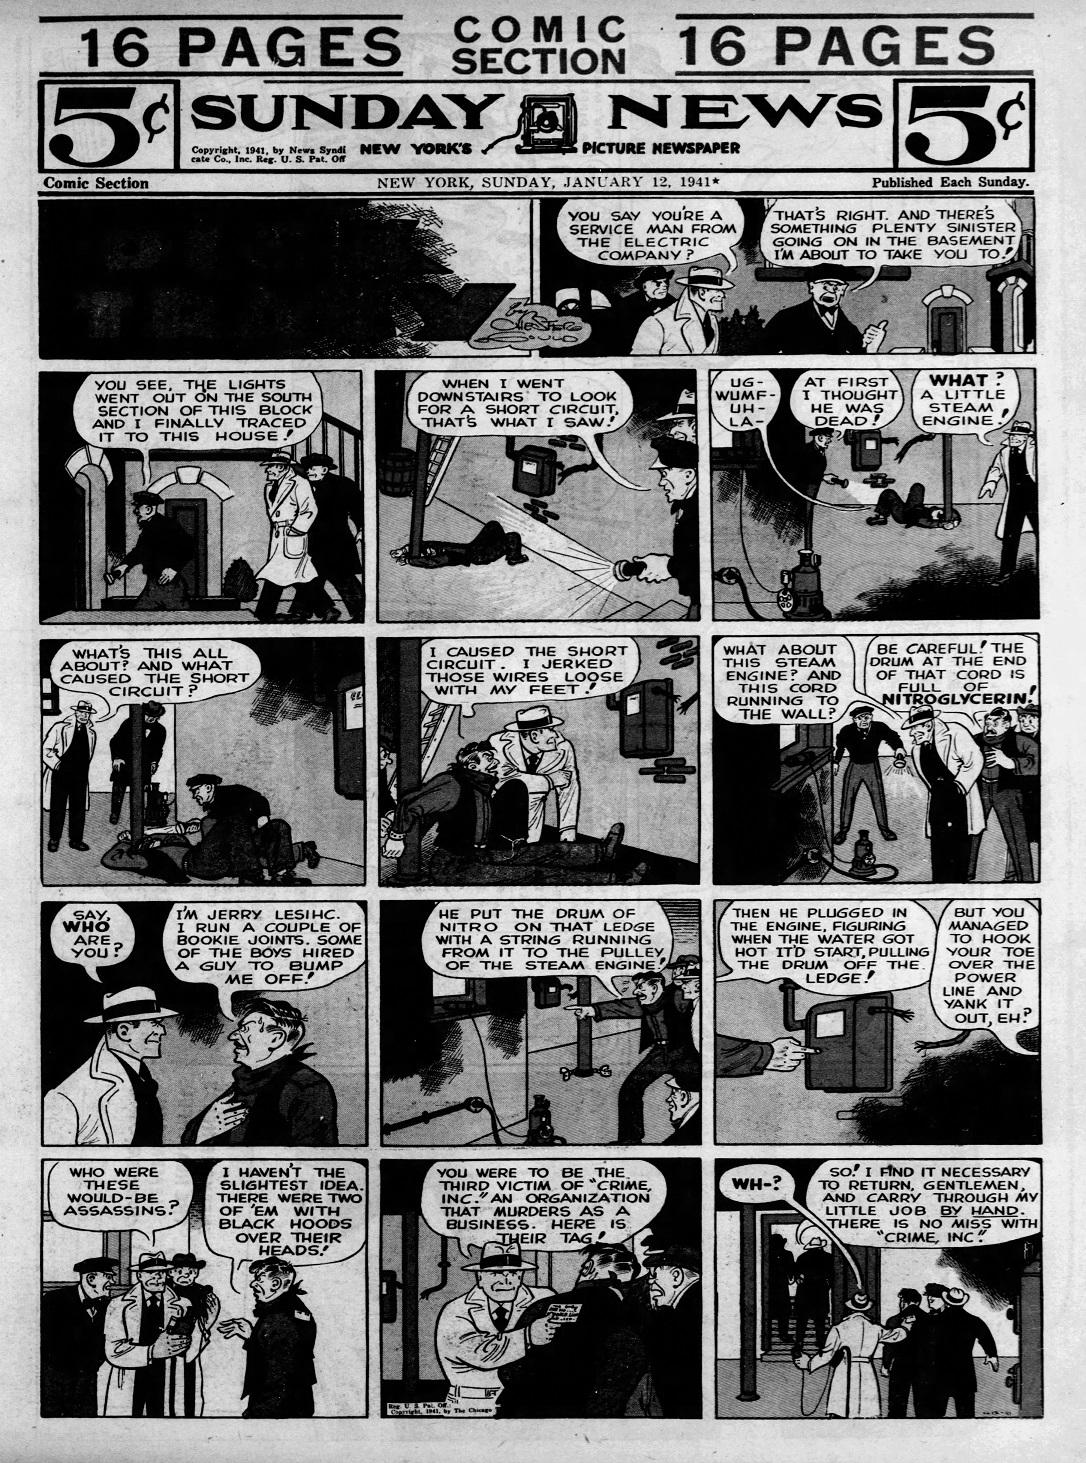 Daily_News_Sun__Jan_12__1941_(2).jpg